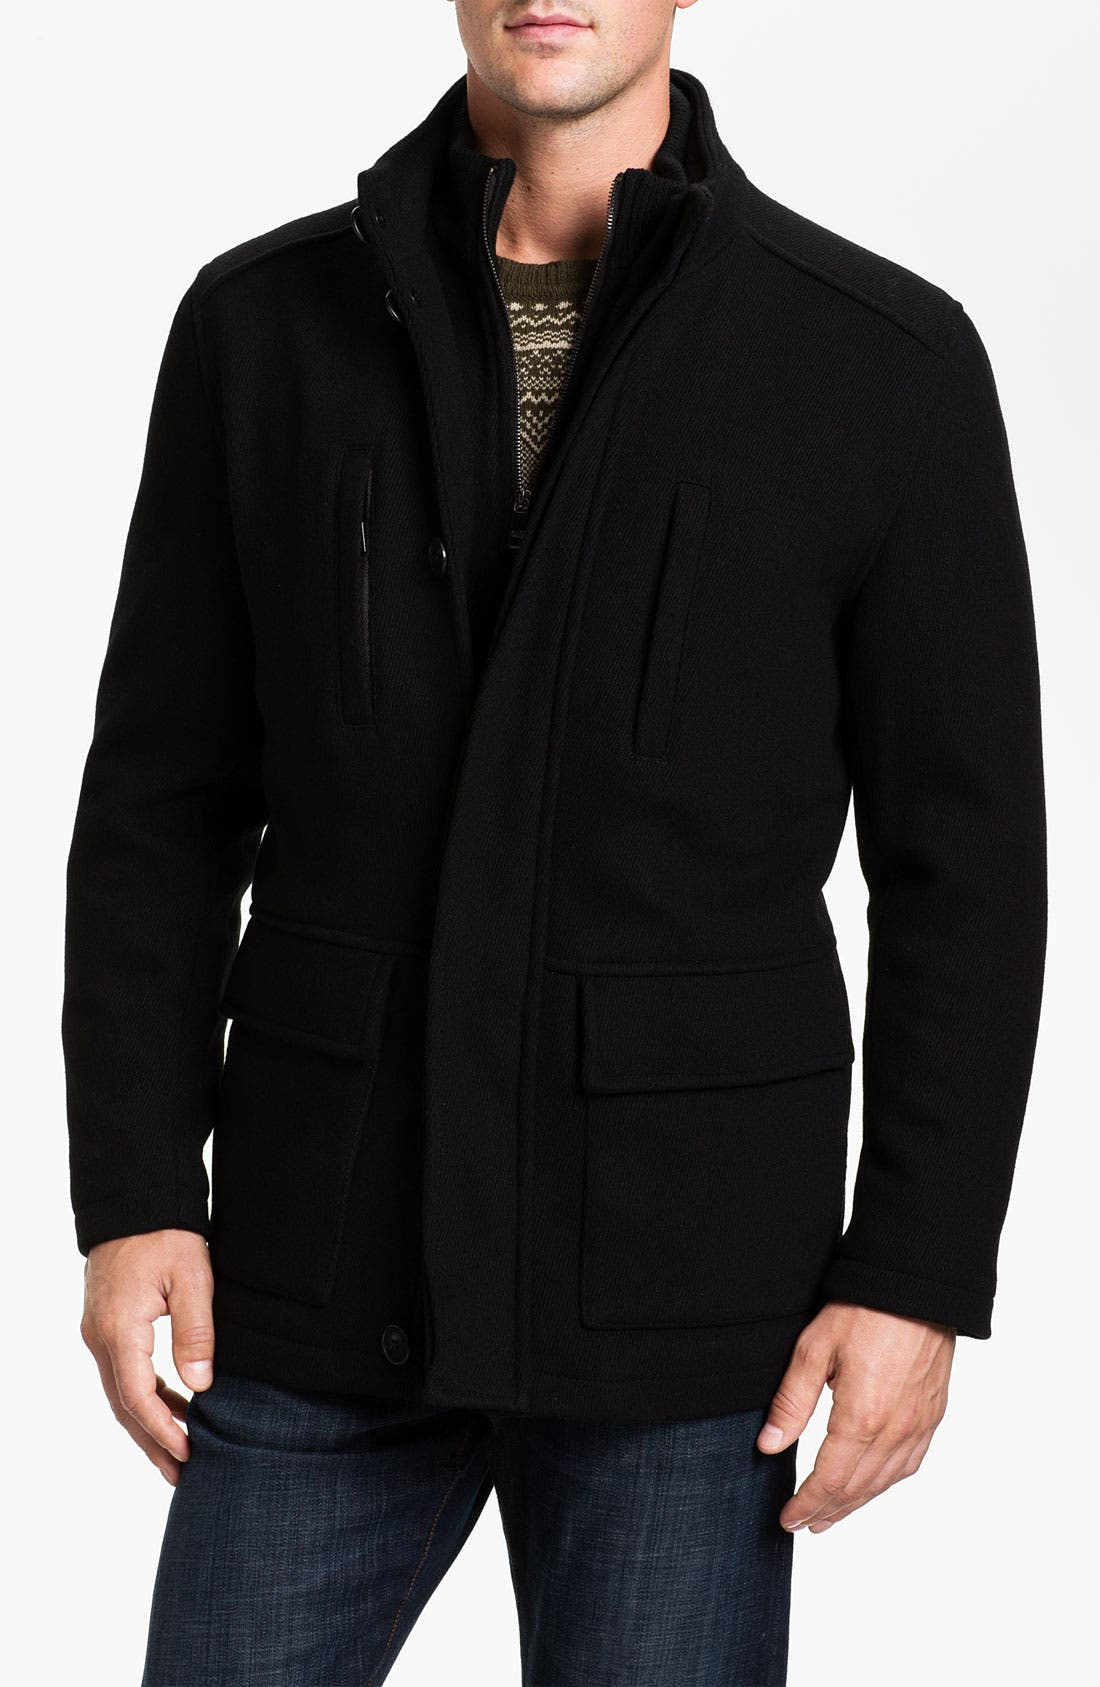 Alternate Image 1 Selected - Marc New York by Andrew Marc 'Keenan' Wool Blend Jacket